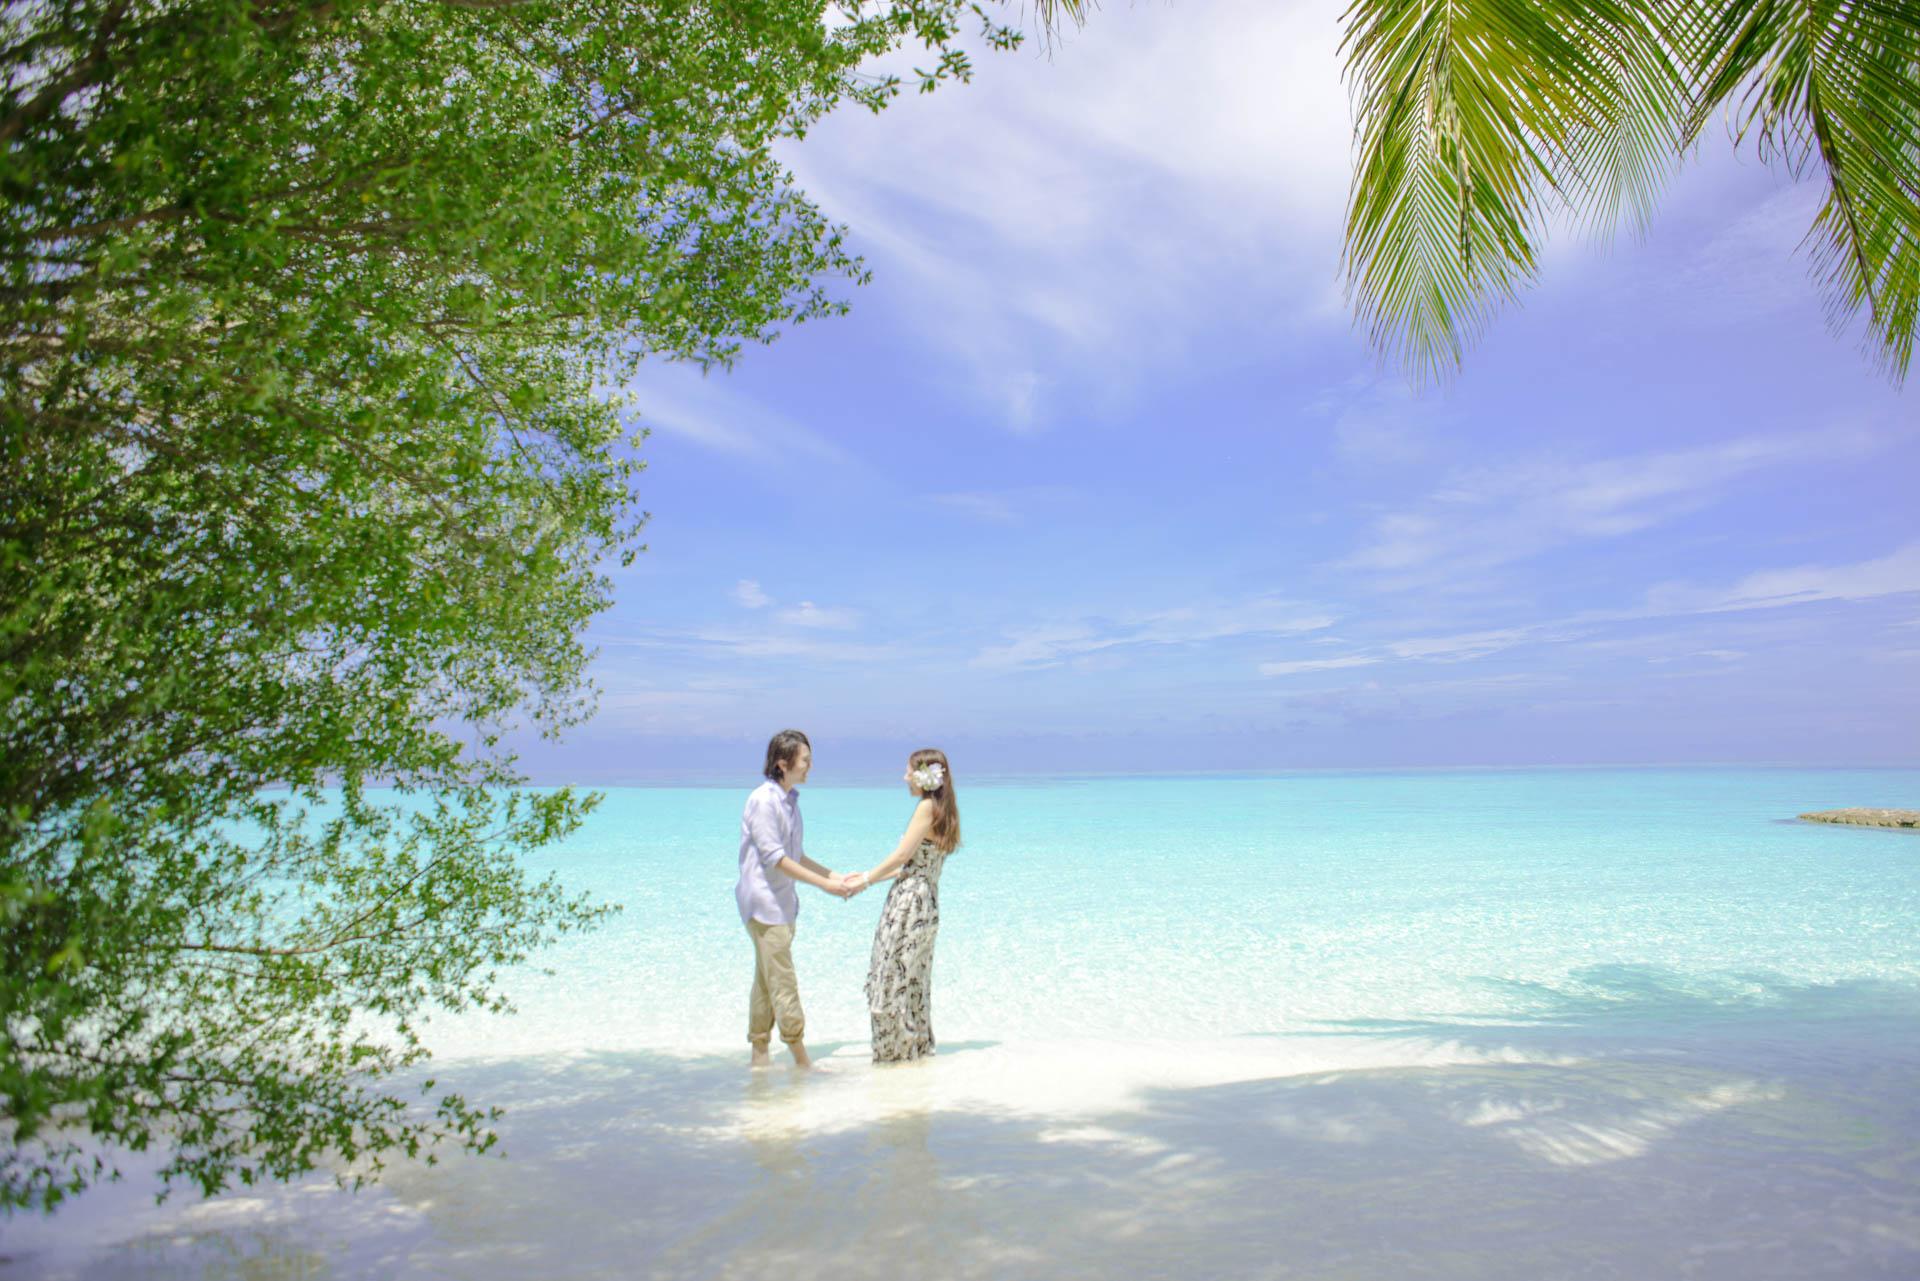 Devin and Natsuko Honeymoon at Makunudhoo Island Maldives 33